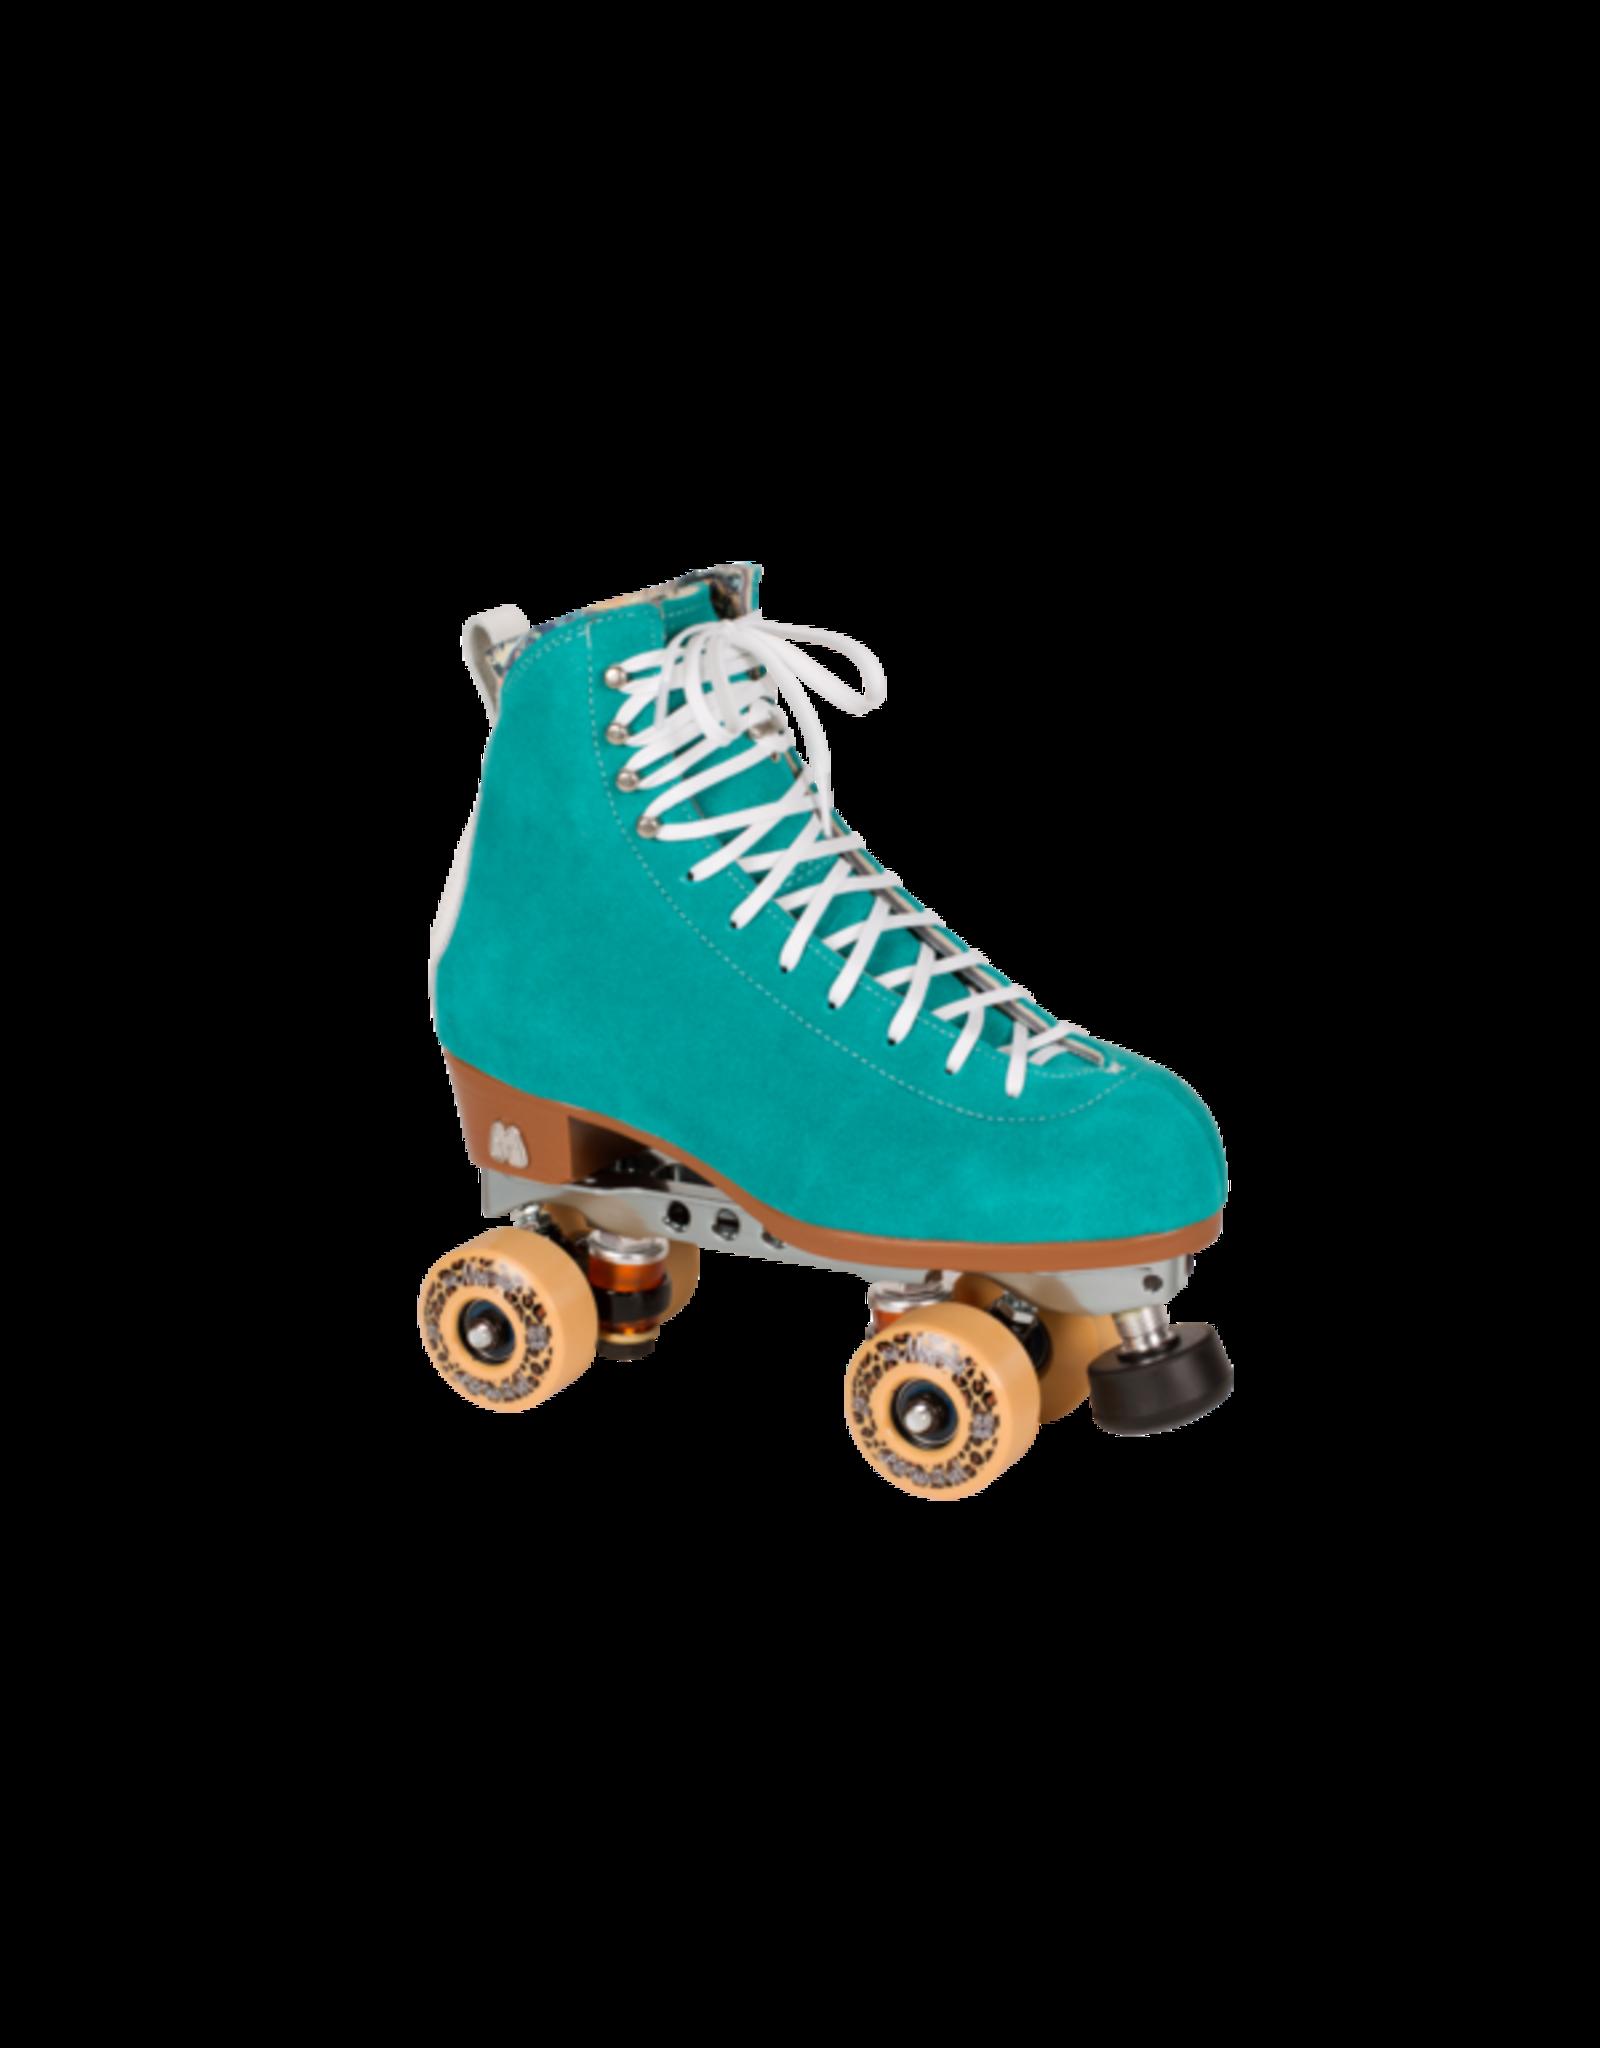 Moxi Skates Moxi Jack Pro